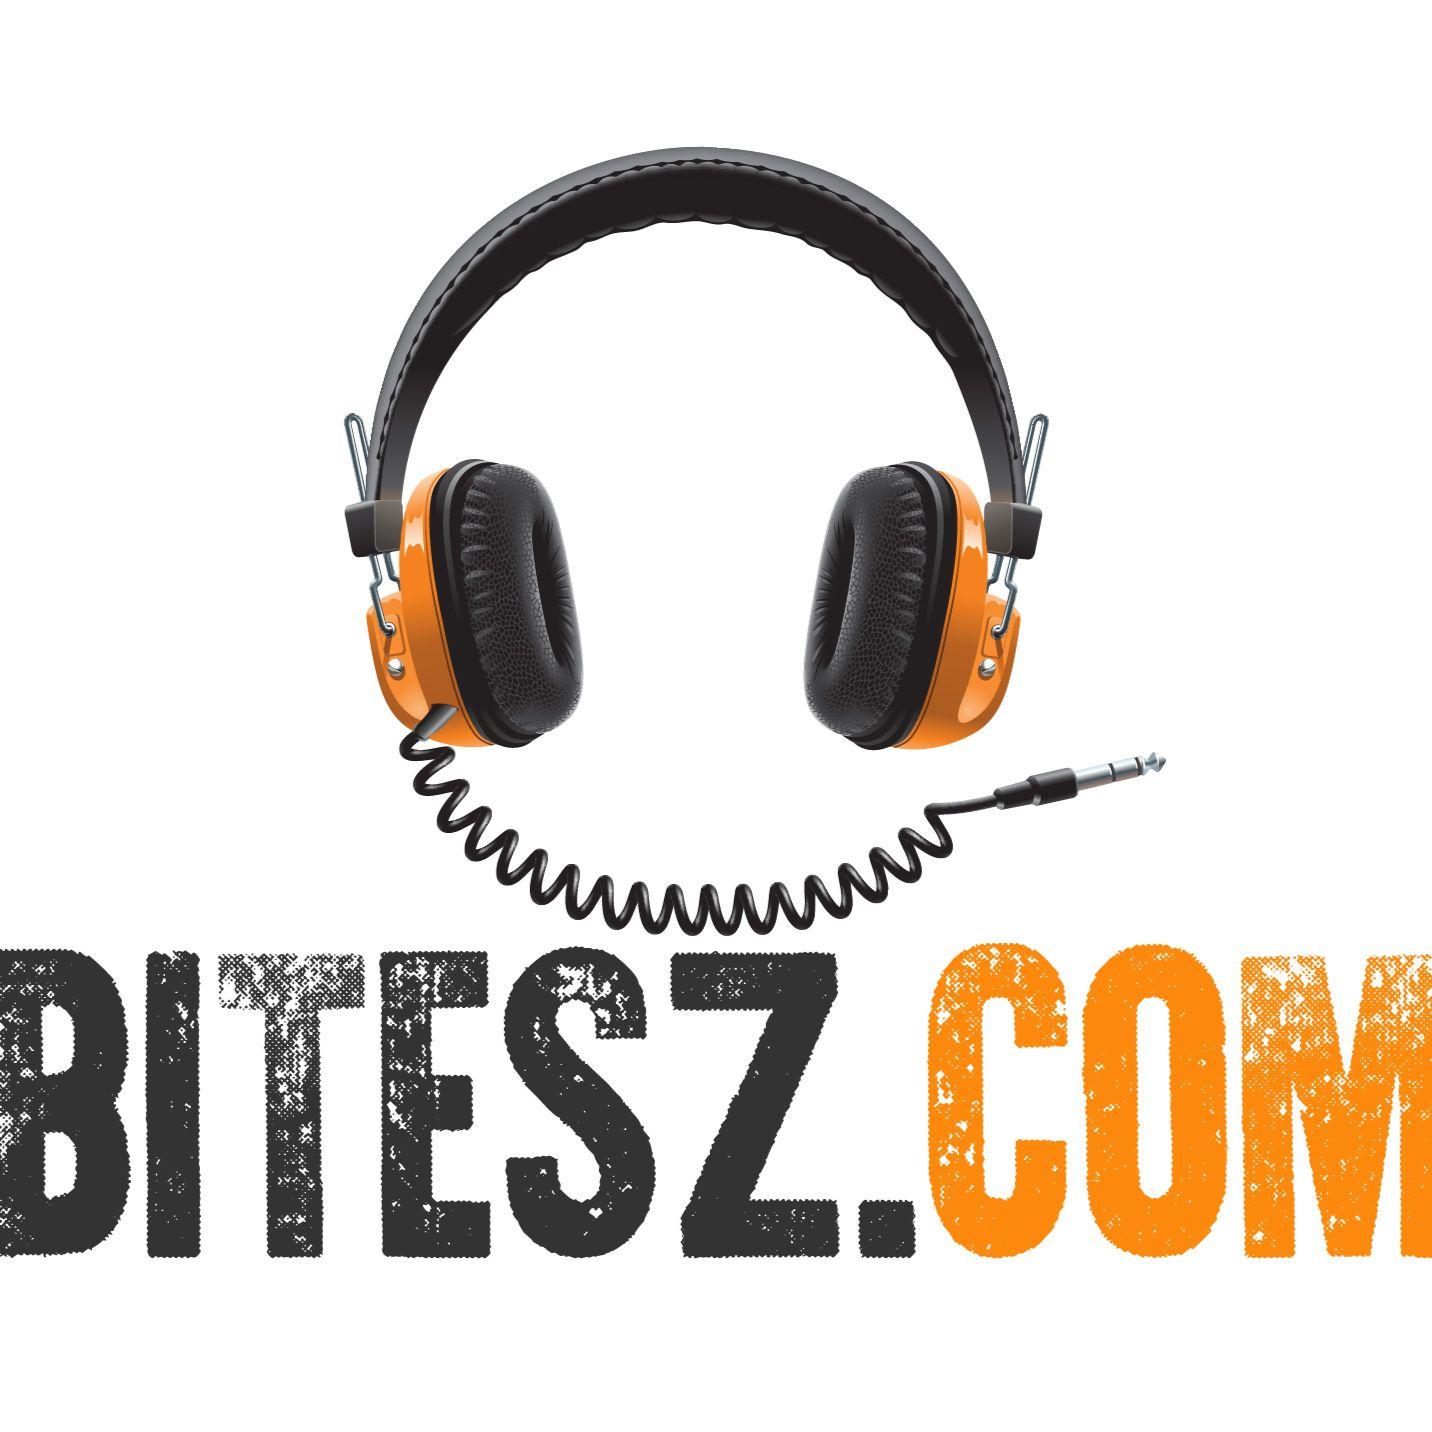 bitesz.com